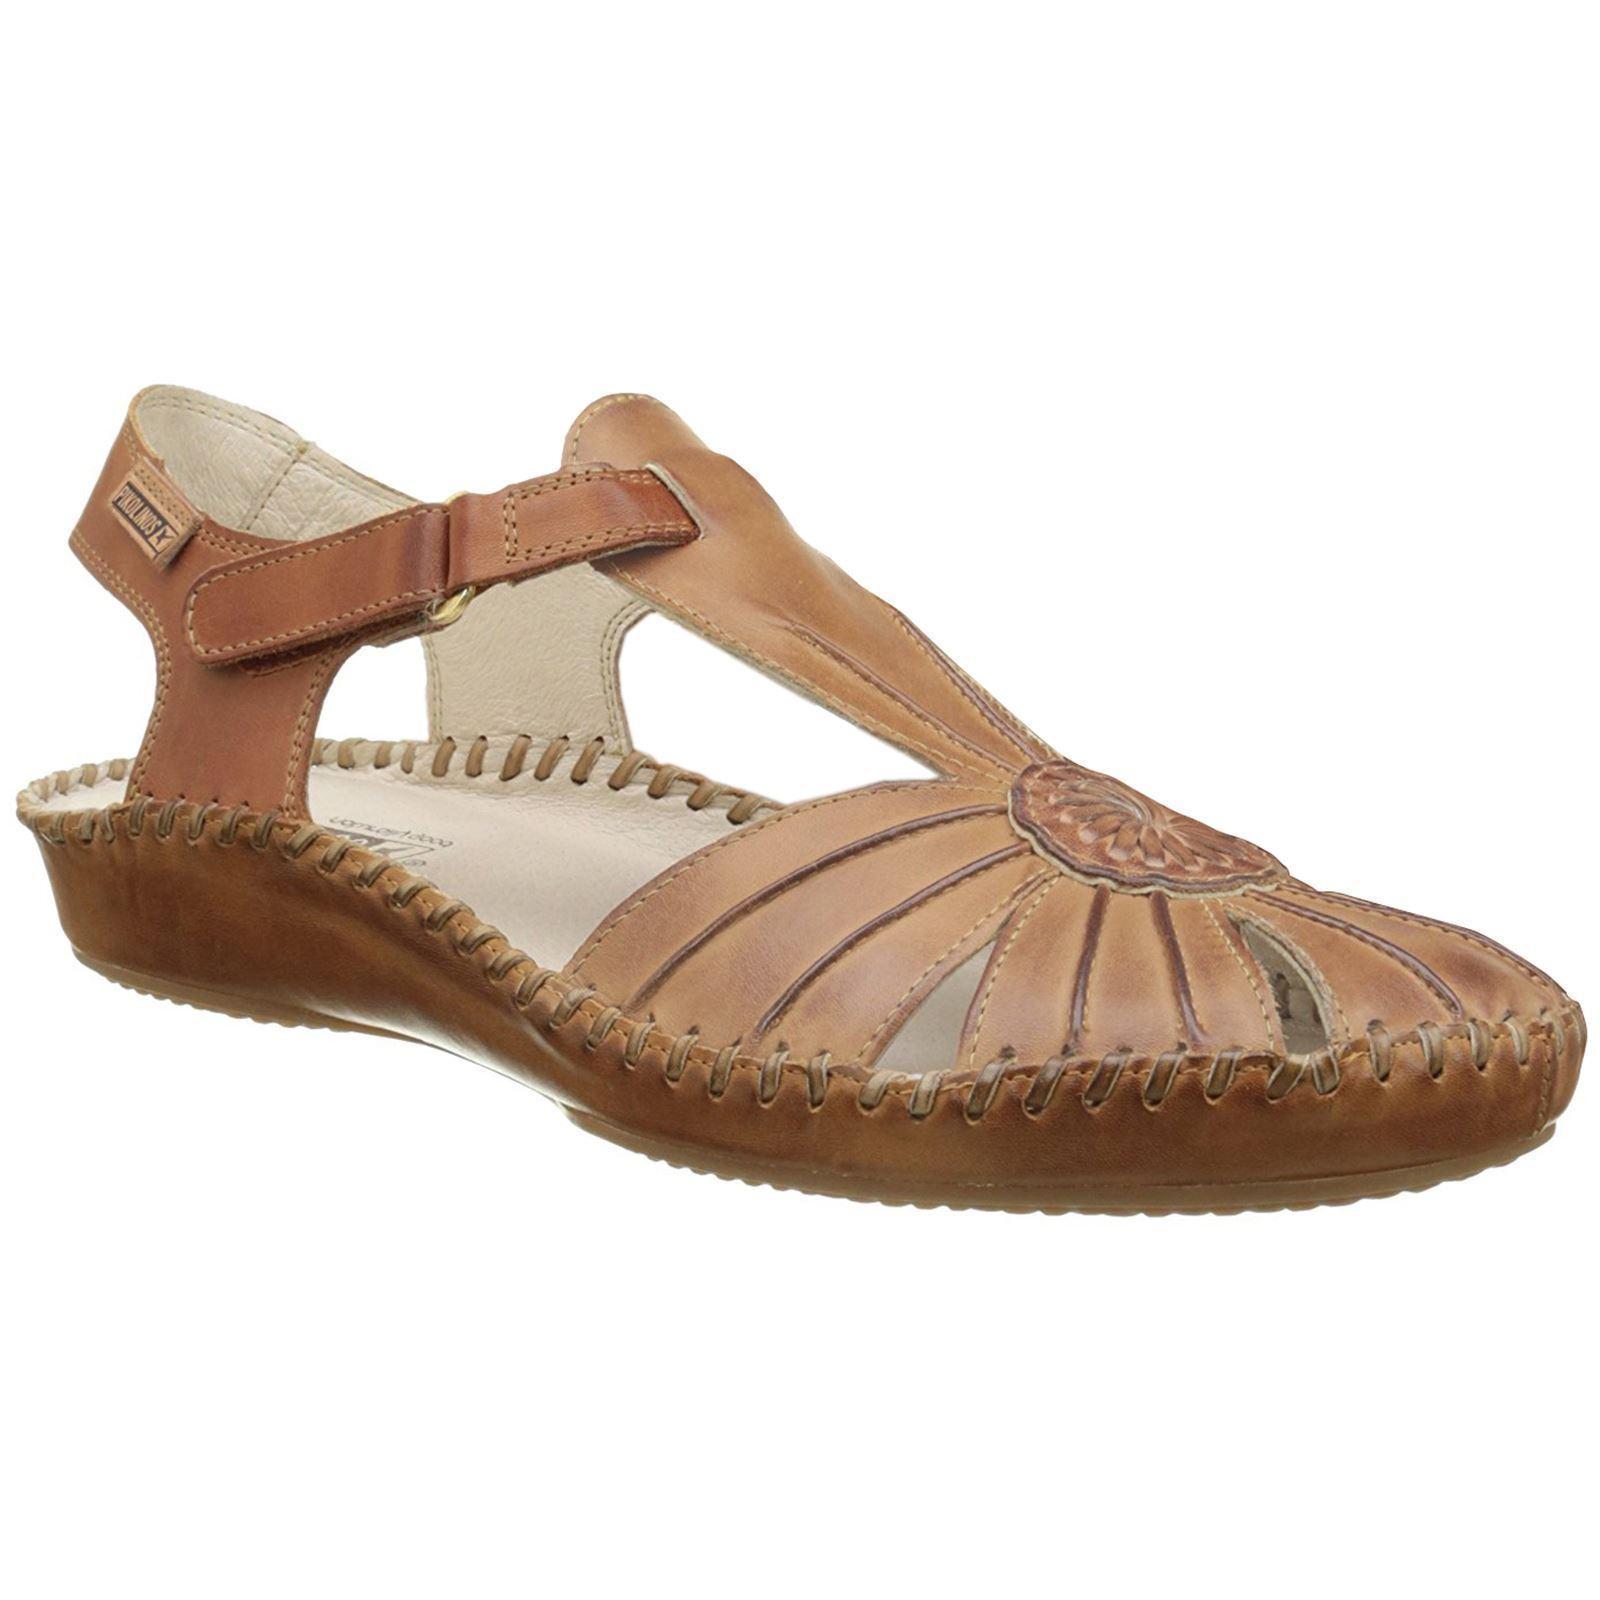 Pikolinos Puerto Vallarta 655-8899C1 Ivory Womens Leather T-Bar Sandals- 39/9